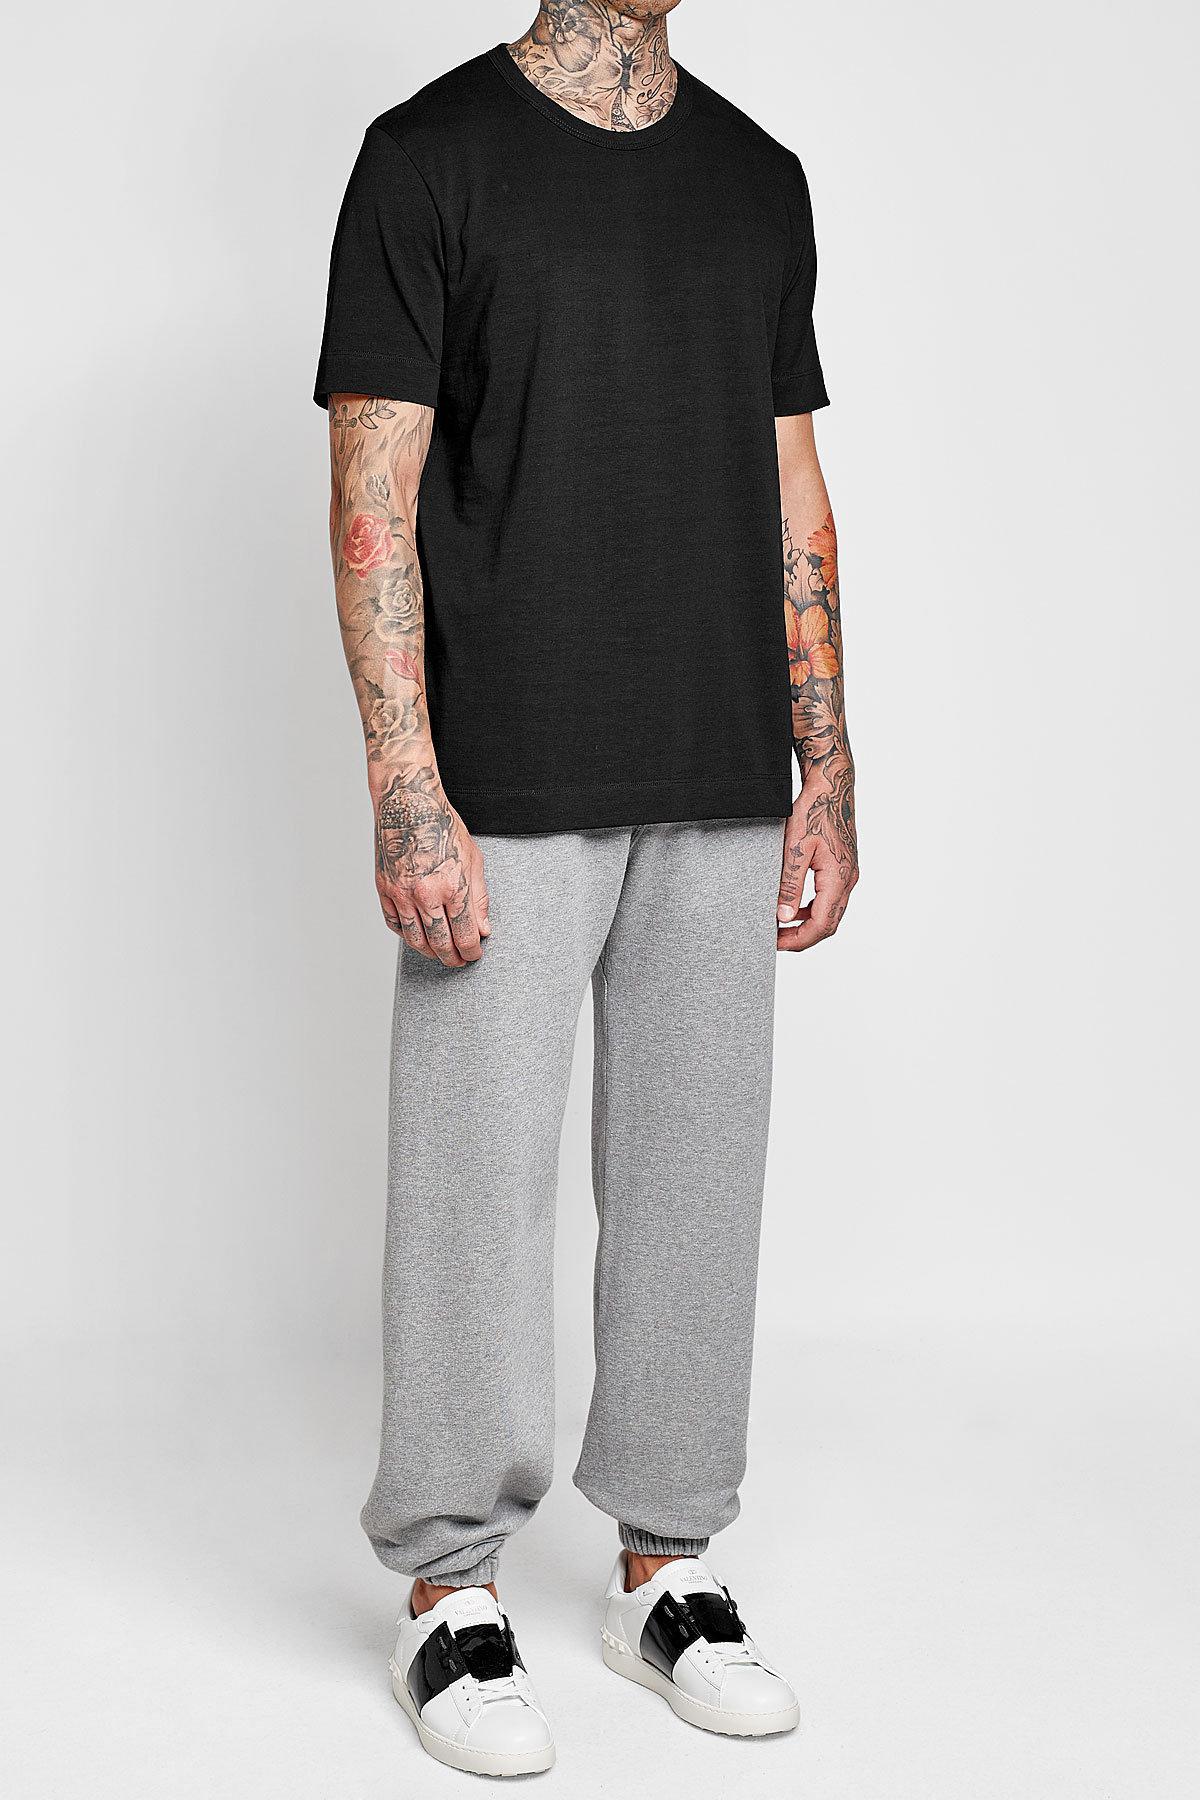 Jil sander cotton t shirt in black for men lyst for Jil sander mens shirt